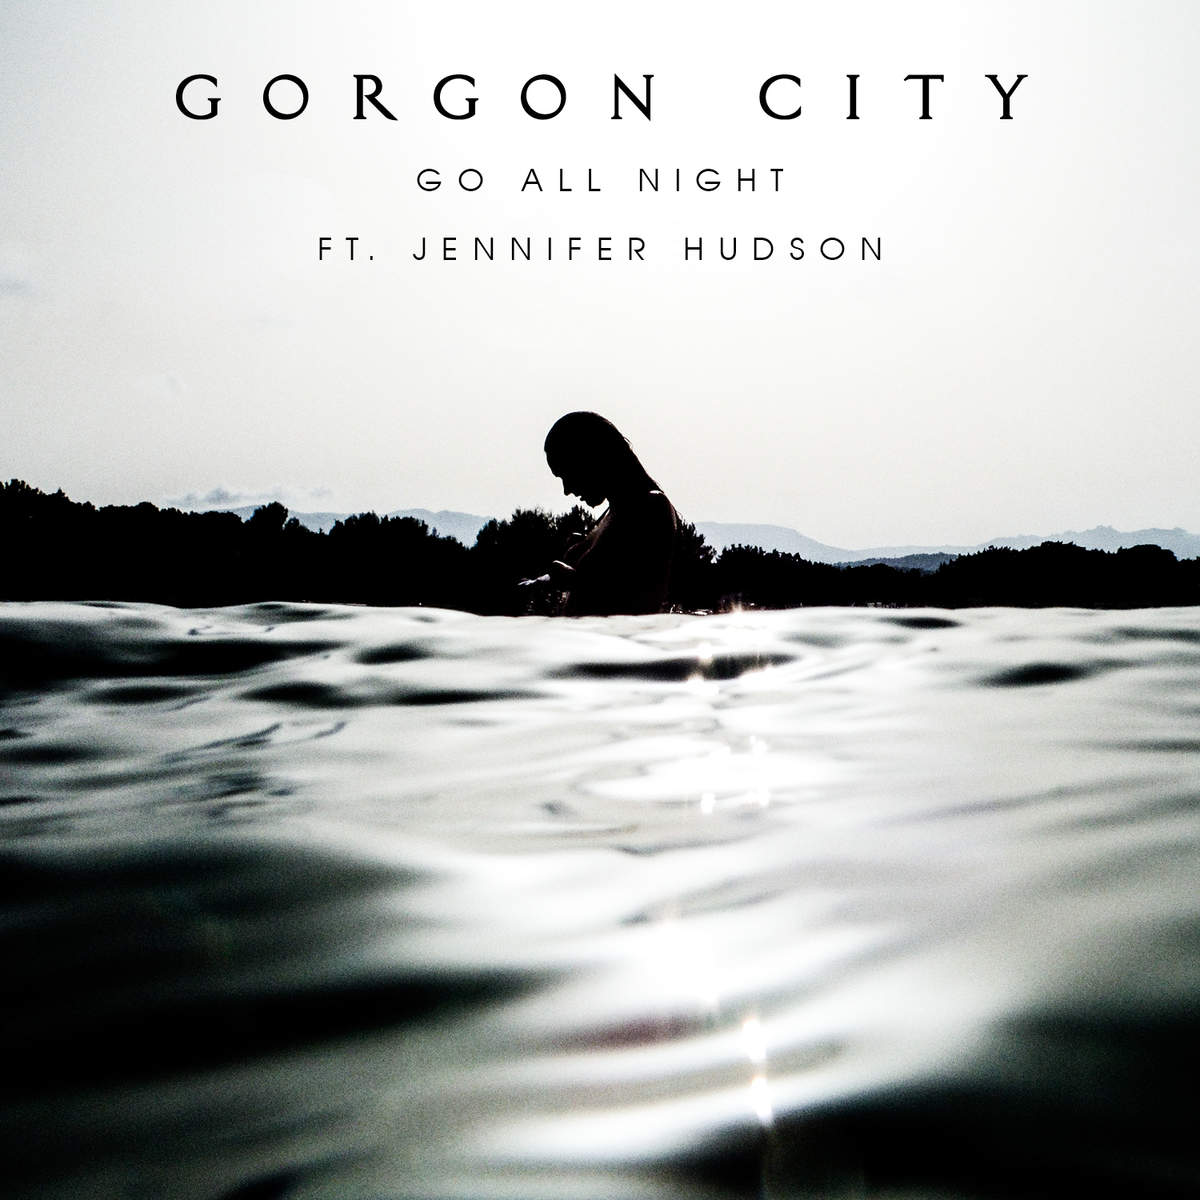 Gorgon City Go All Night